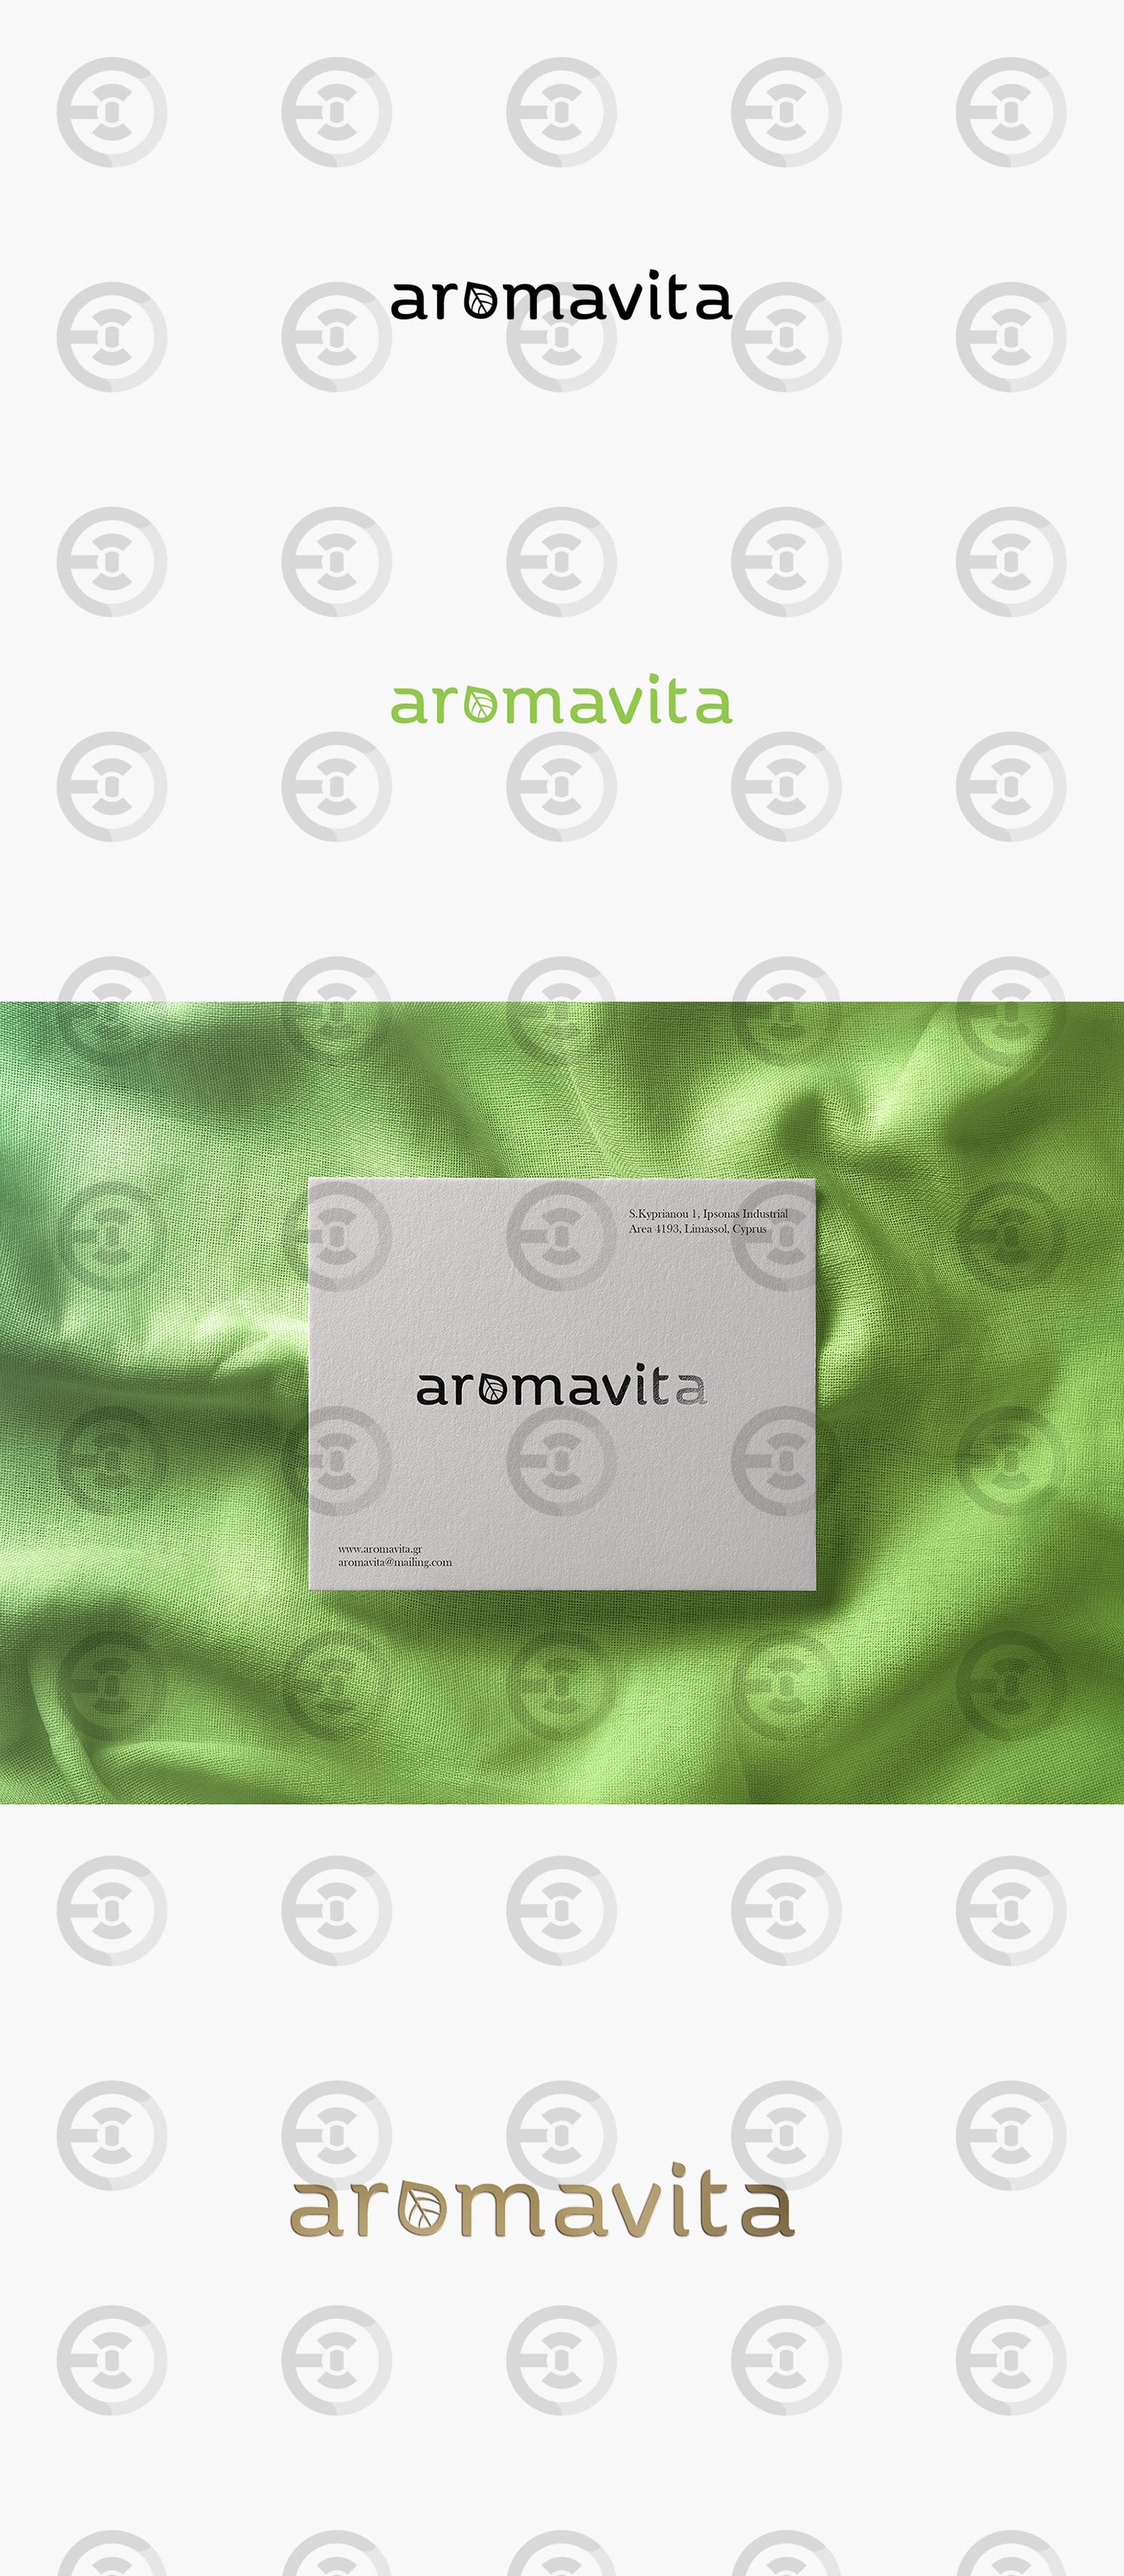 Aromavita.jpg